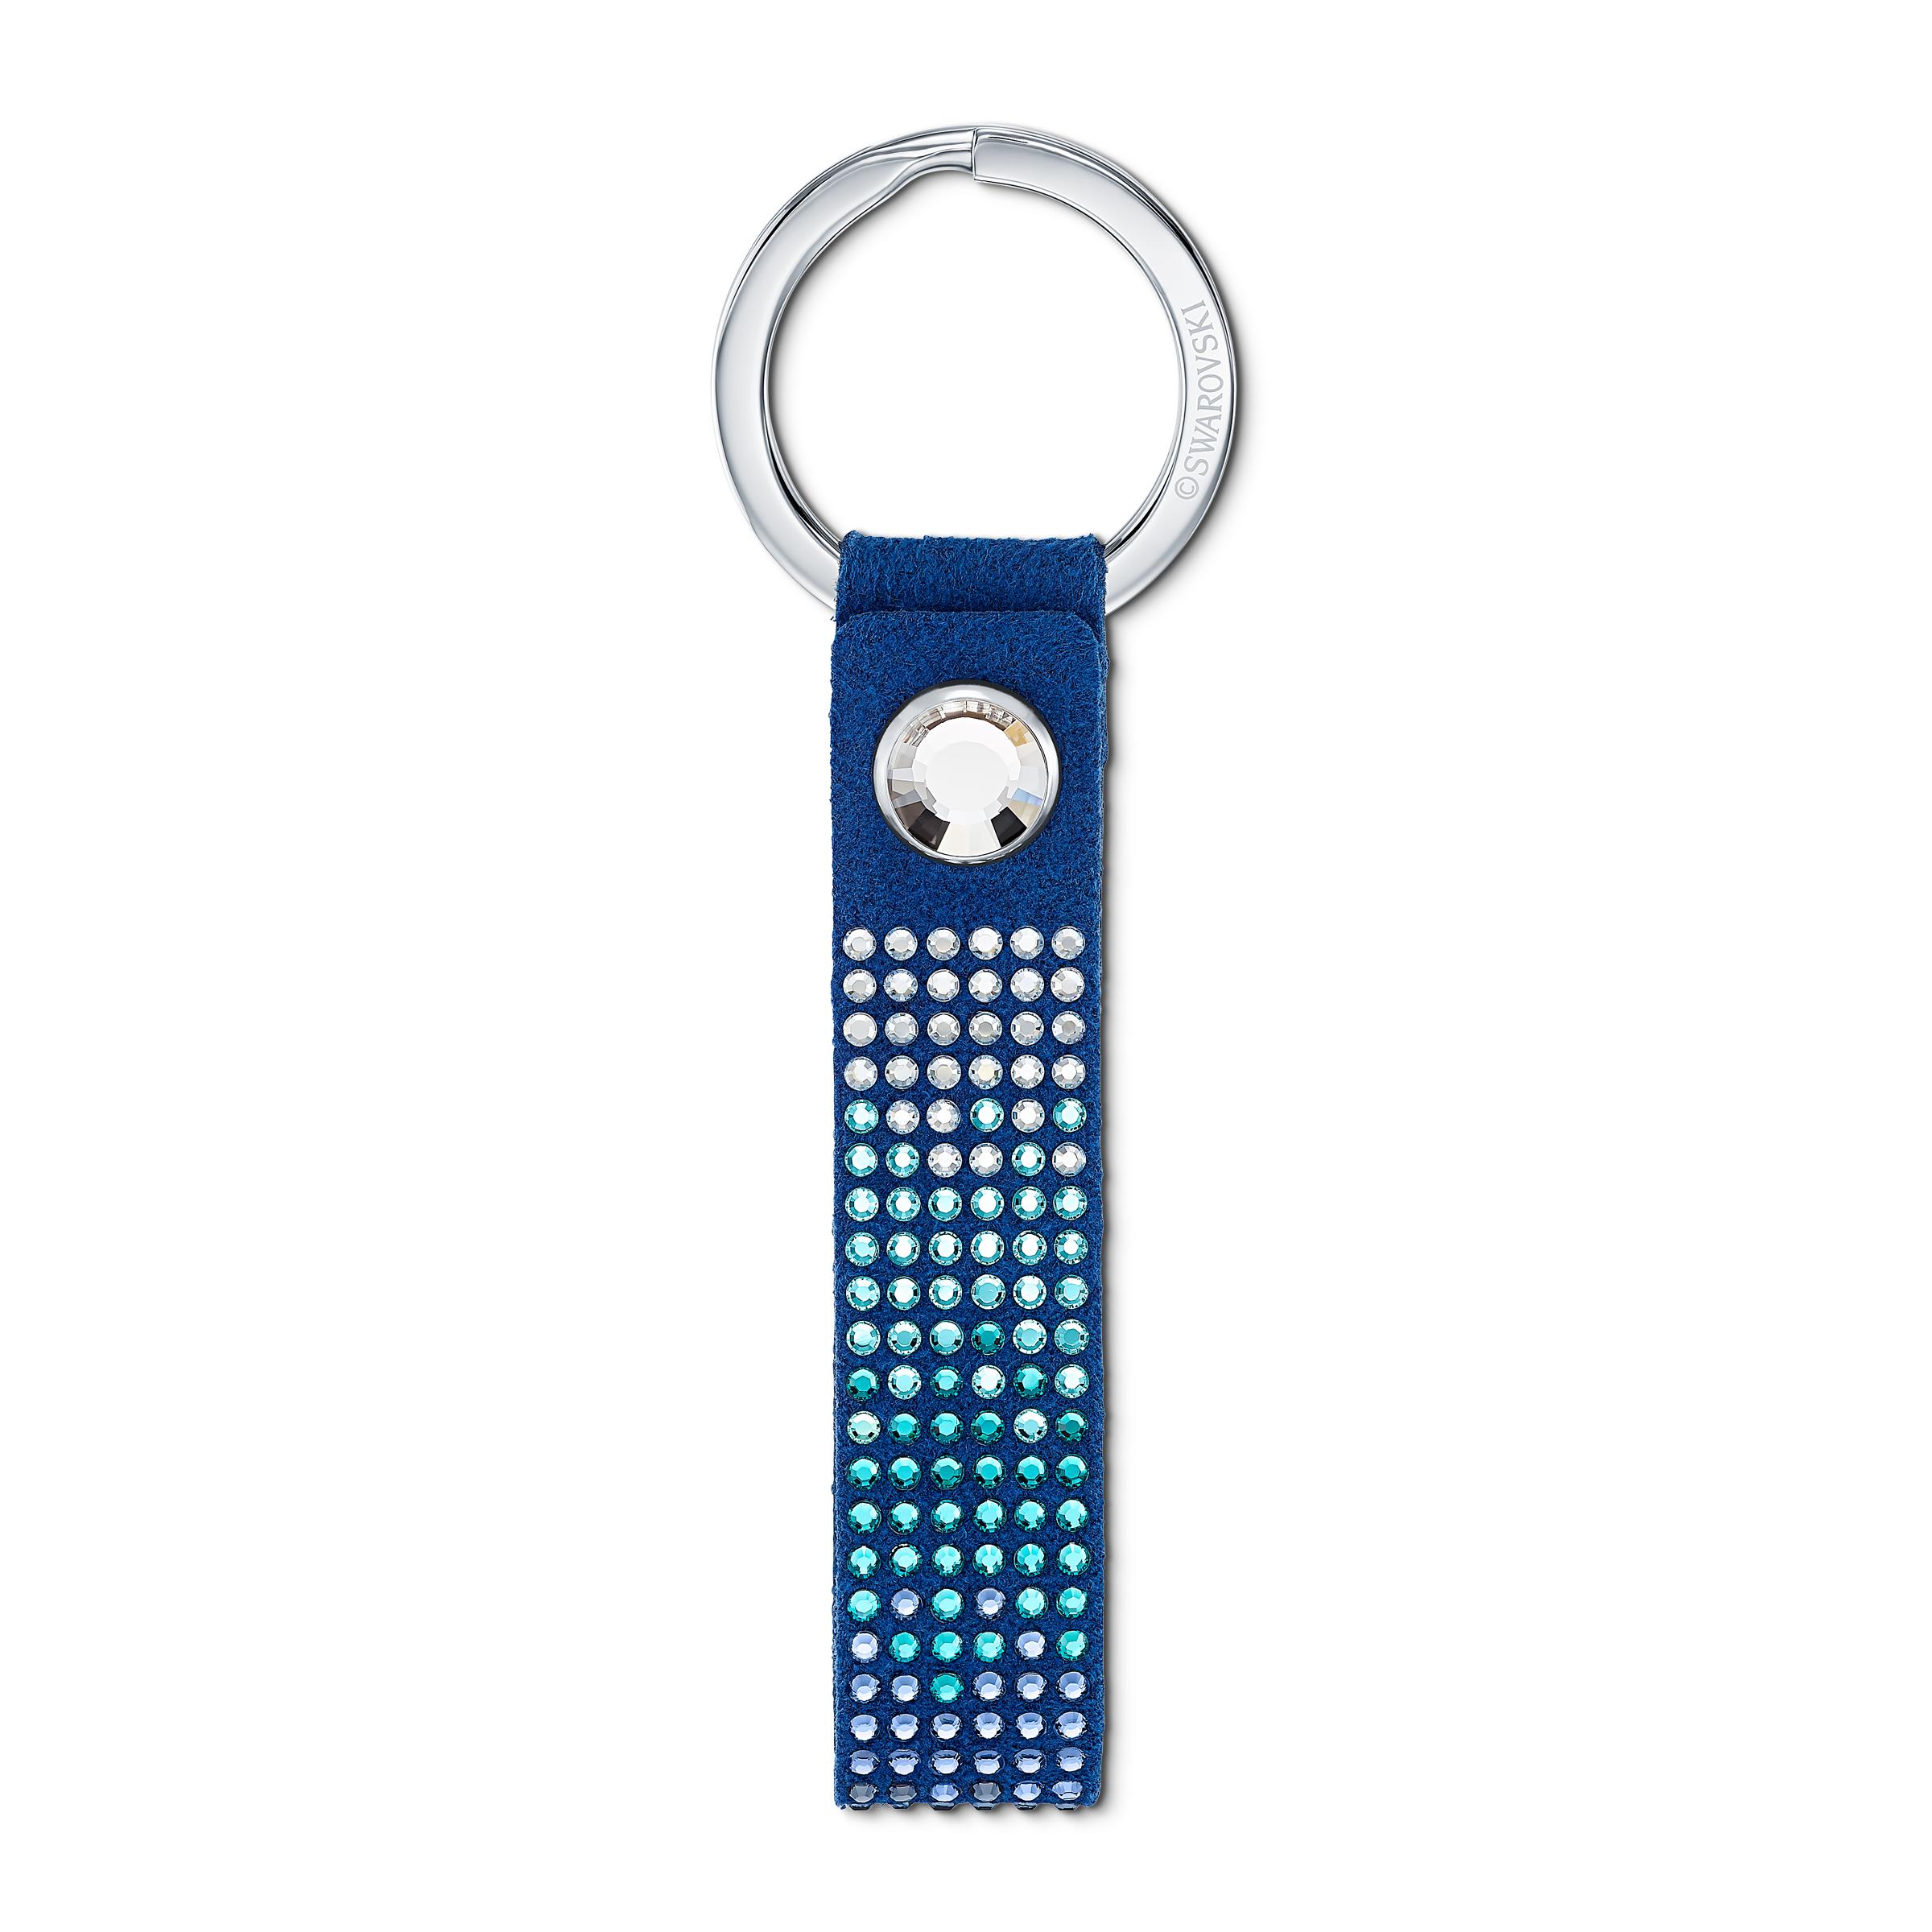 Porte-clés Anniversary, bleu, acier inoxydable, Swarovski